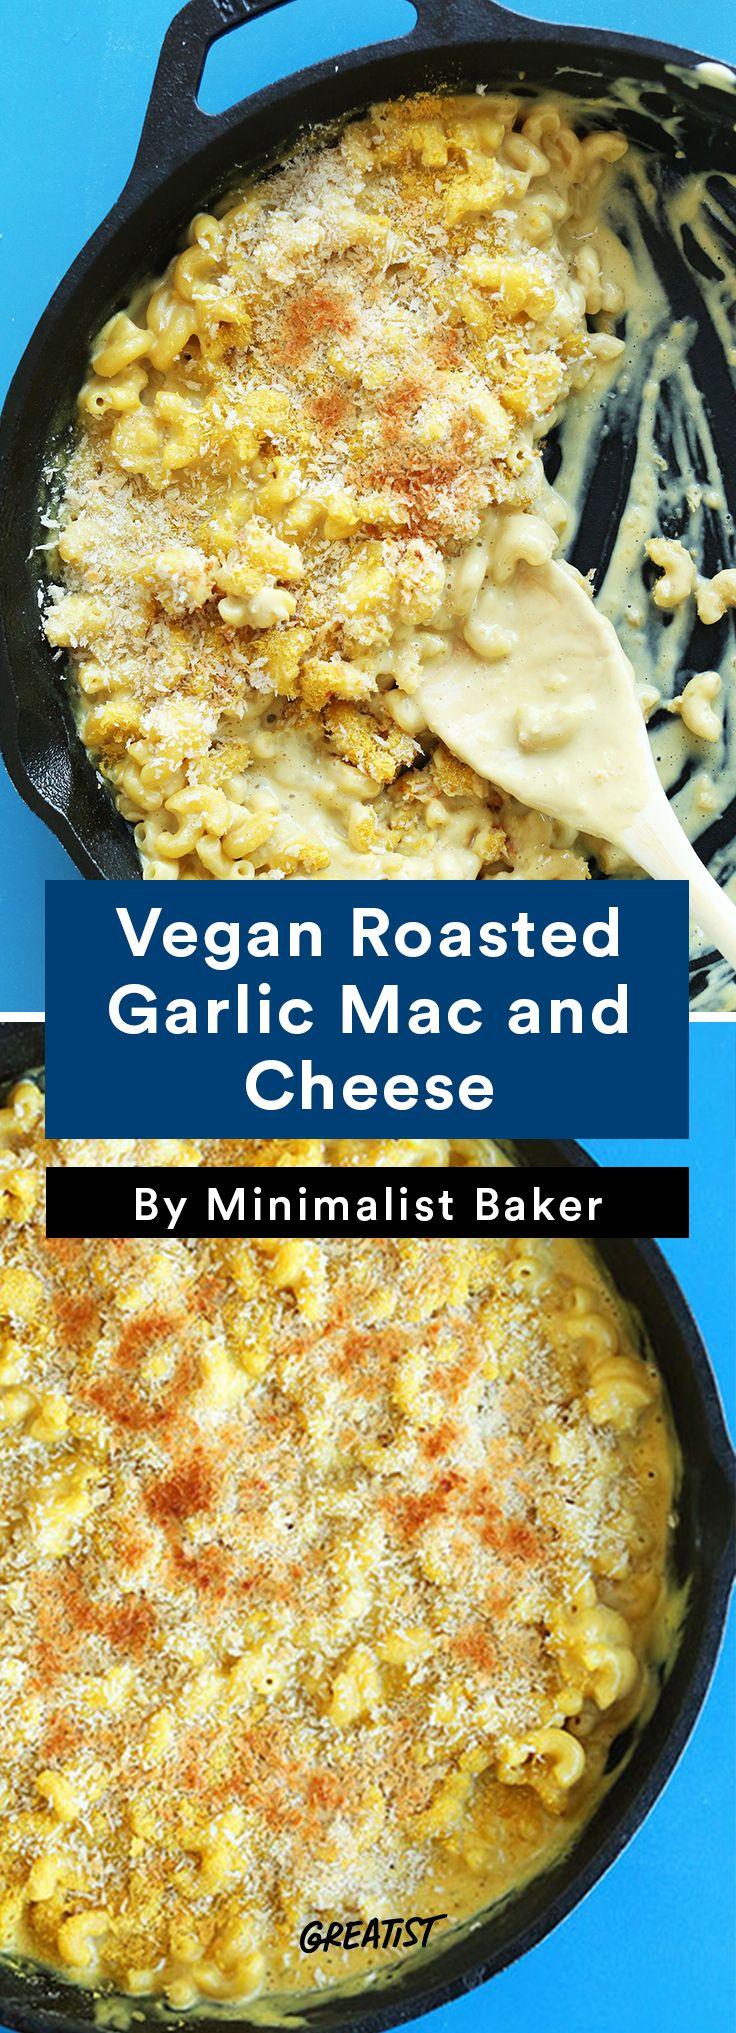 2. Vegan Roasted Garlic Mac and Cheese #vegan #mac #and #cheese #recipes http://greatist.com/eat/vegan-mac-and-cheese-recipes-for-your-dairy-free-friends